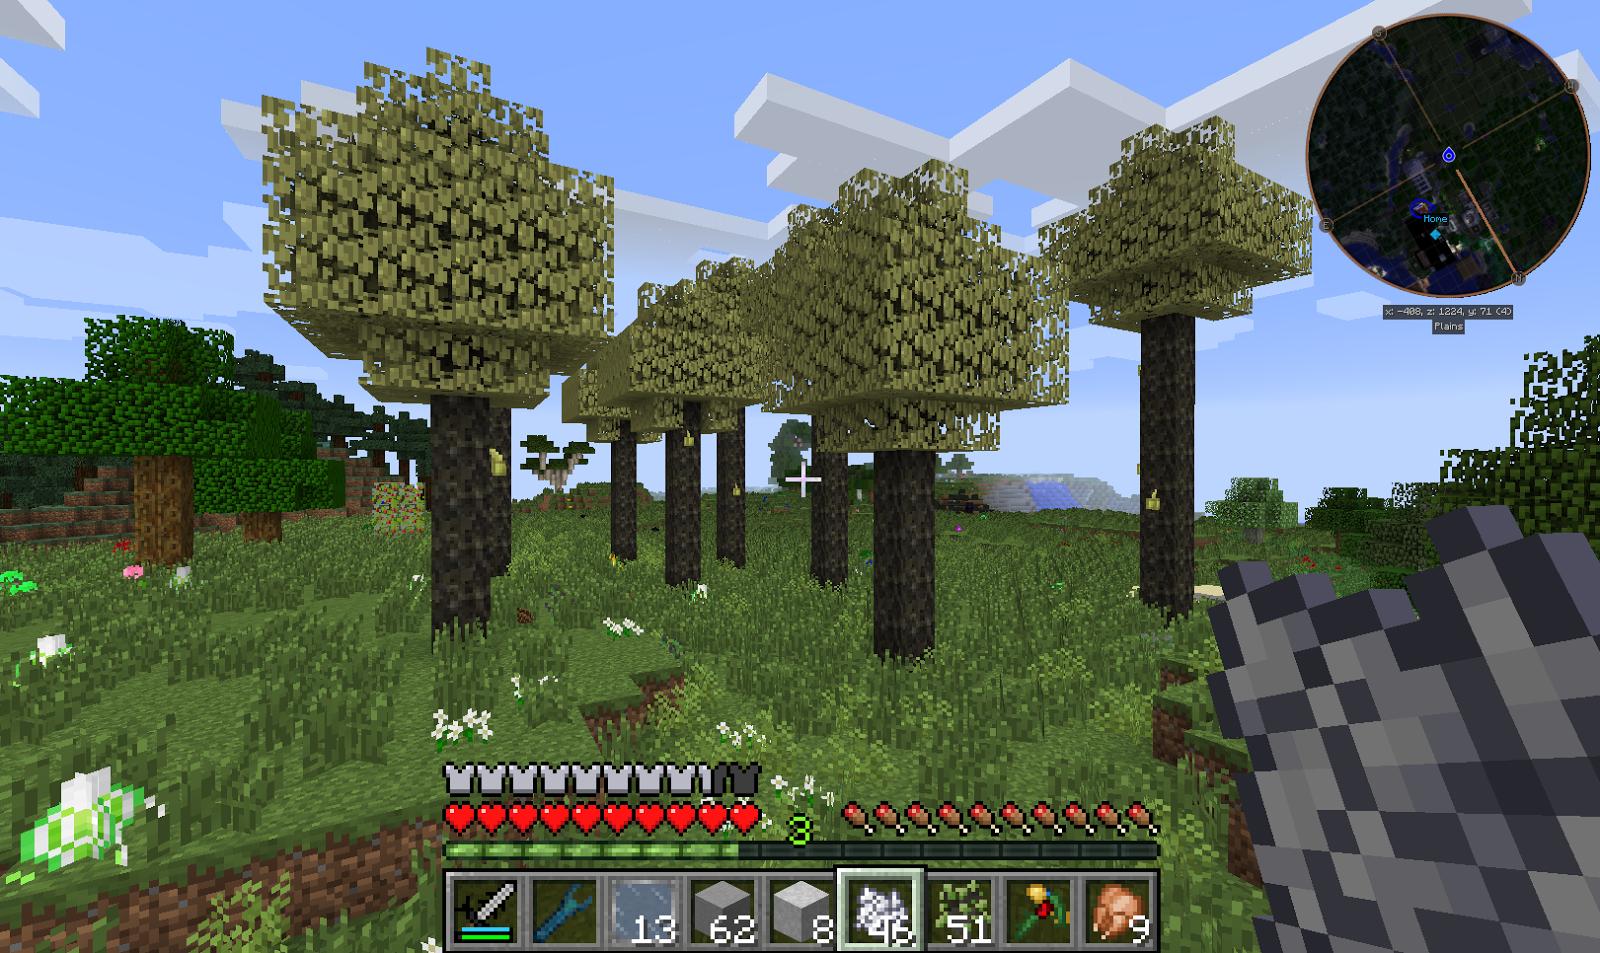 Modjo Minecraft: Extending the Bee Factory